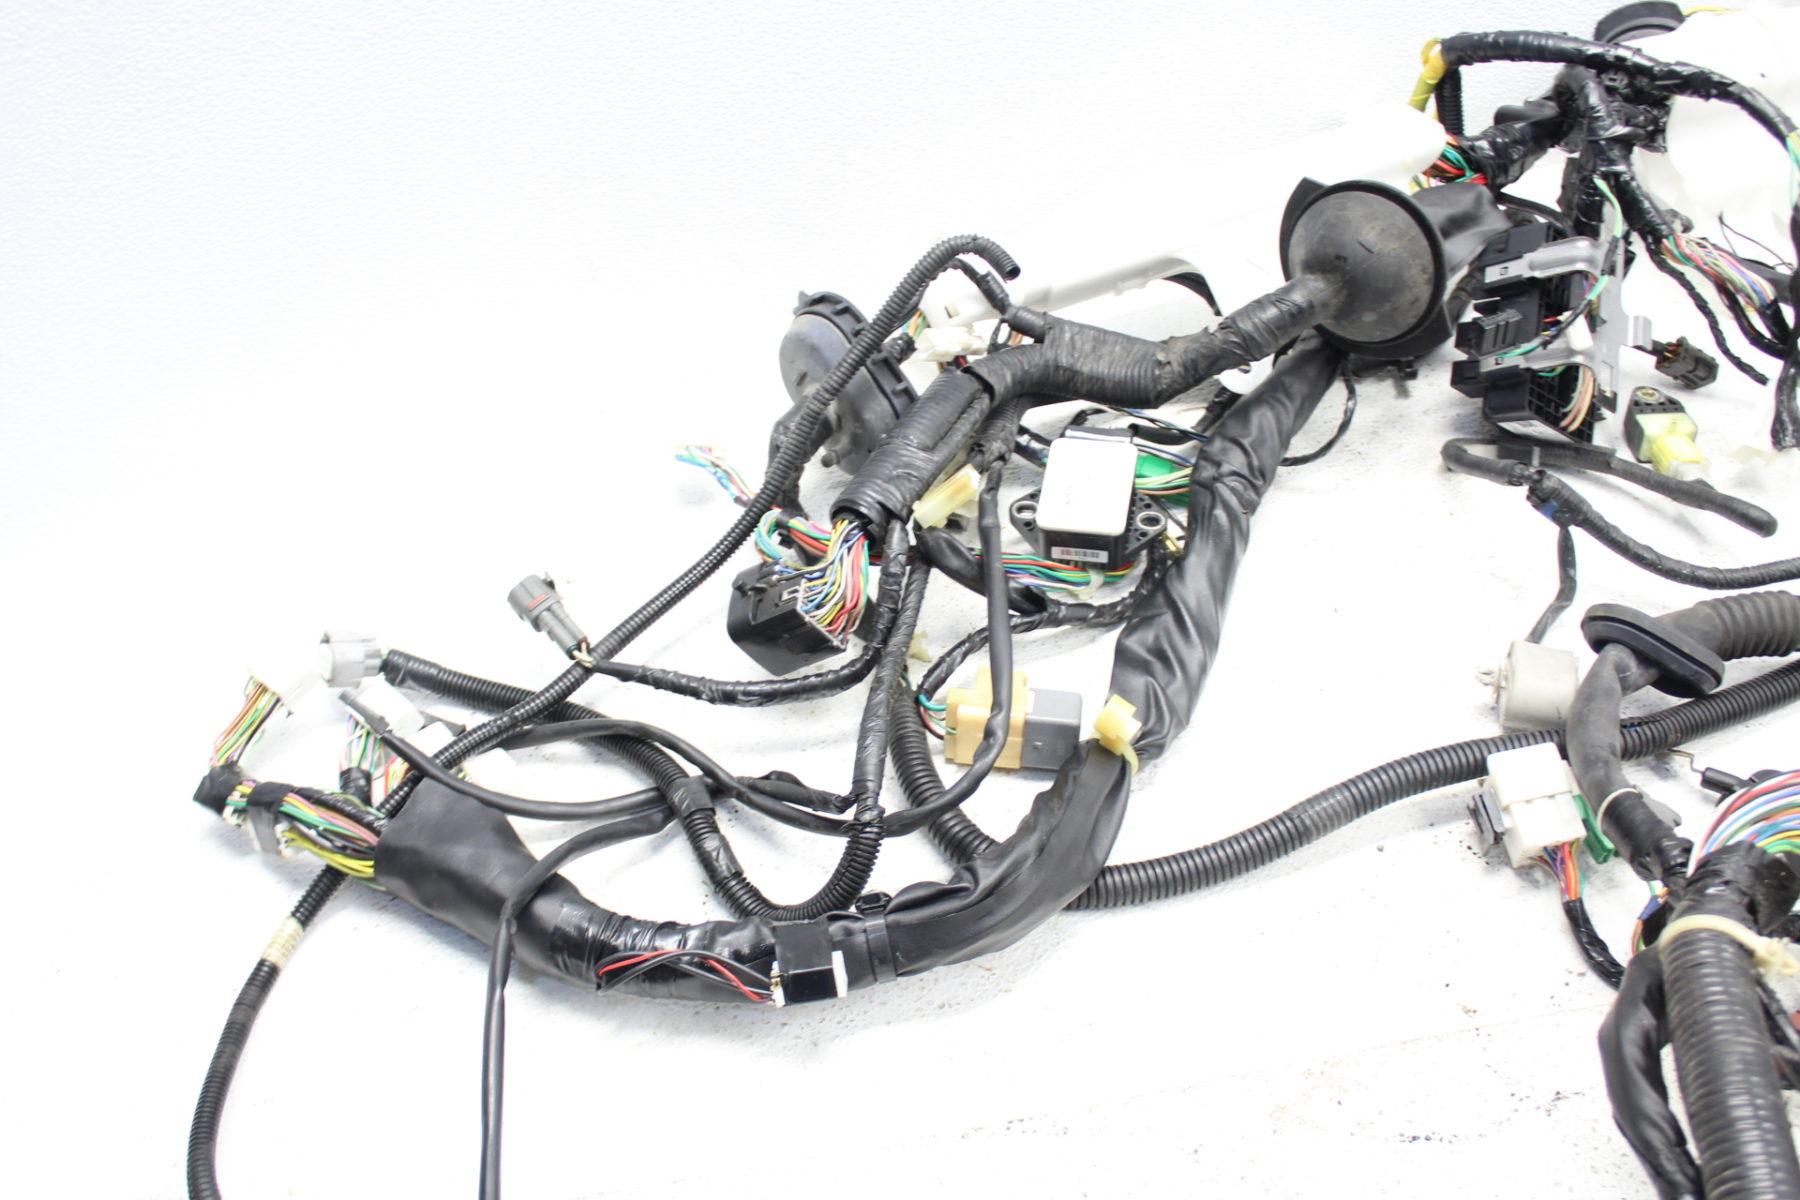 11-14 2011-2014 SUBARU IMPREZA WRX STI DASH BOARD WIRING